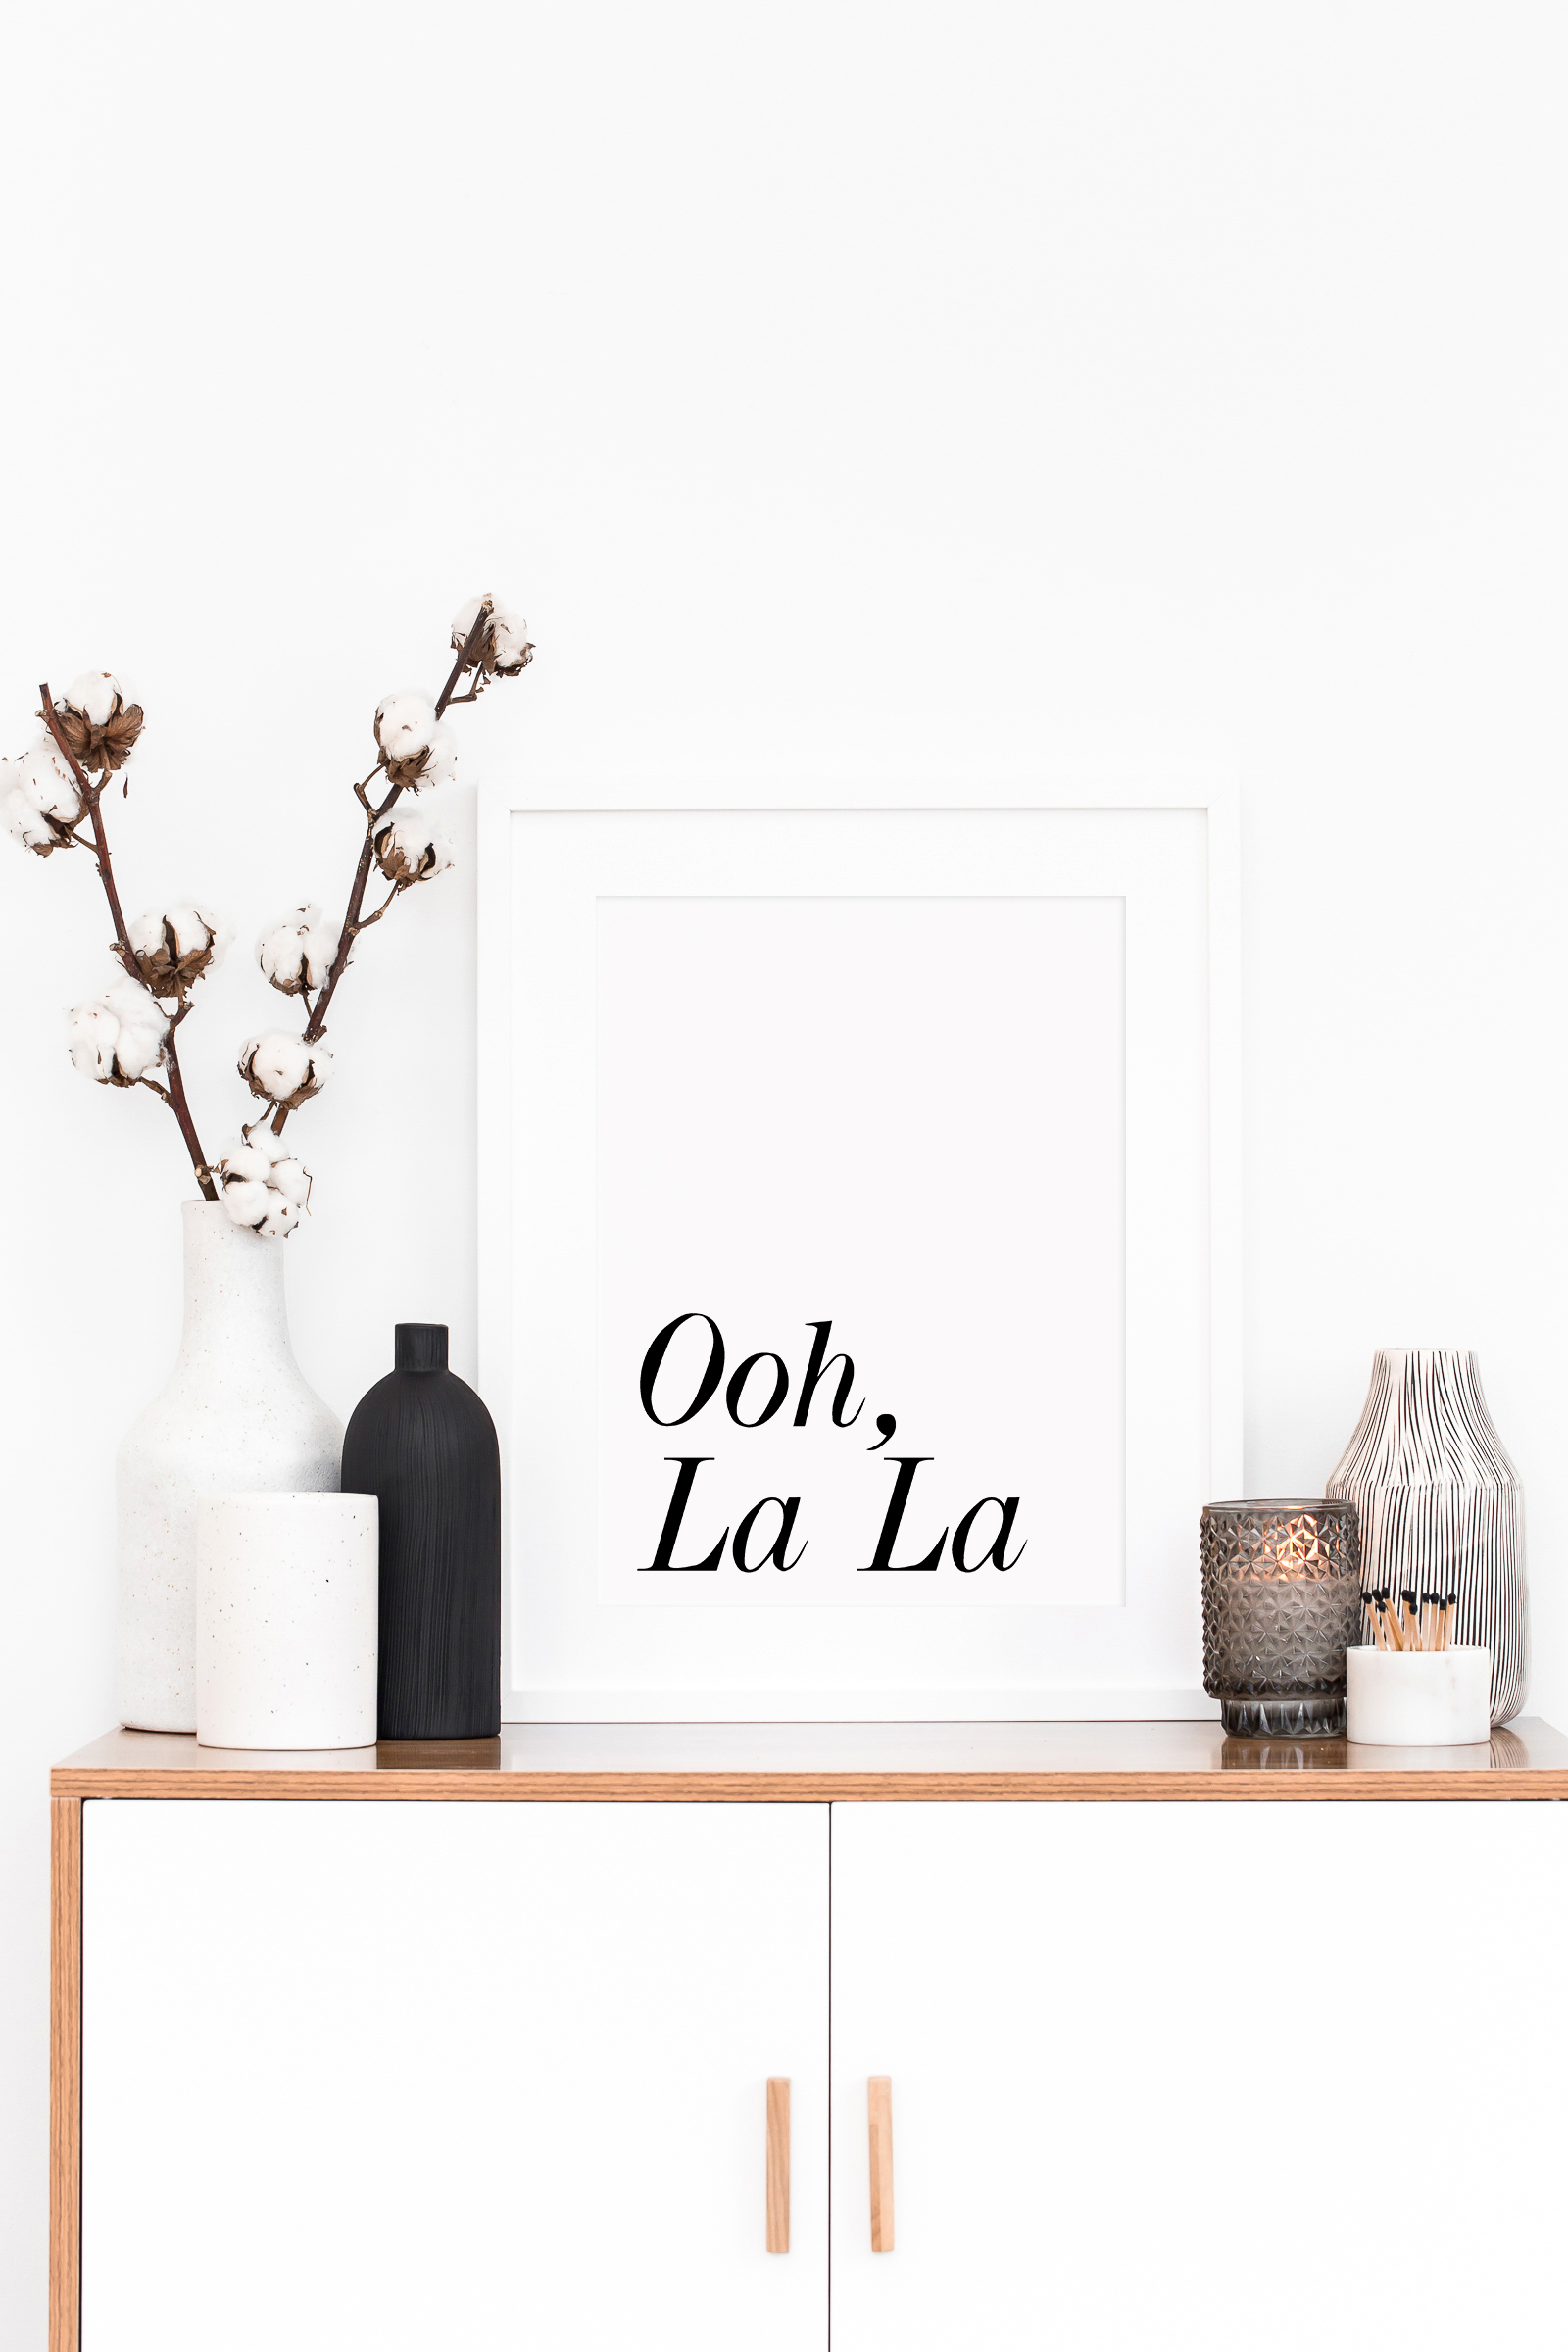 Ooh La La Wall Art Printable For The Bathroom Bedroom Or Living